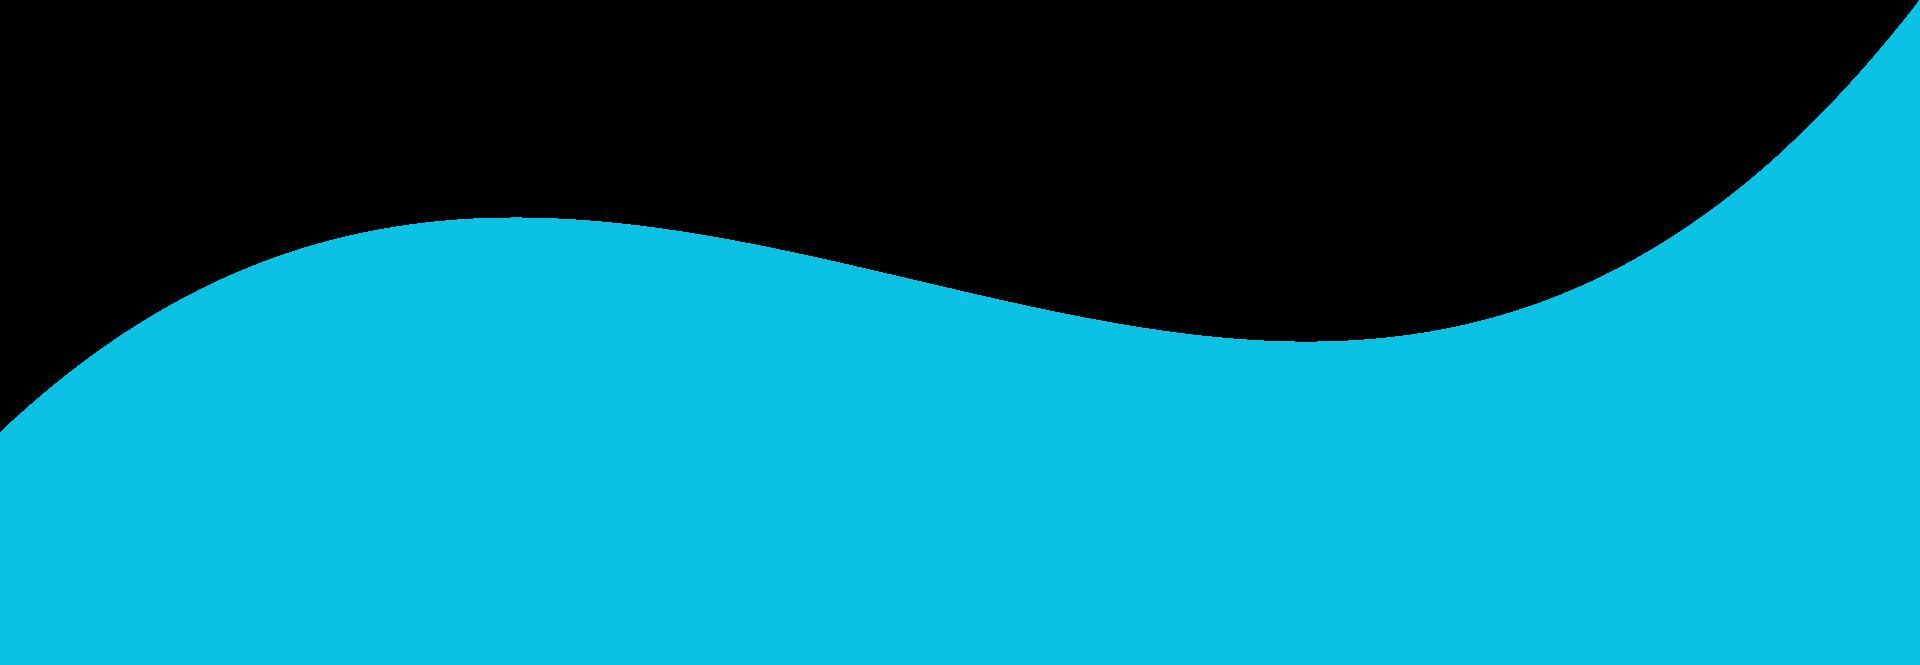 blue slice background